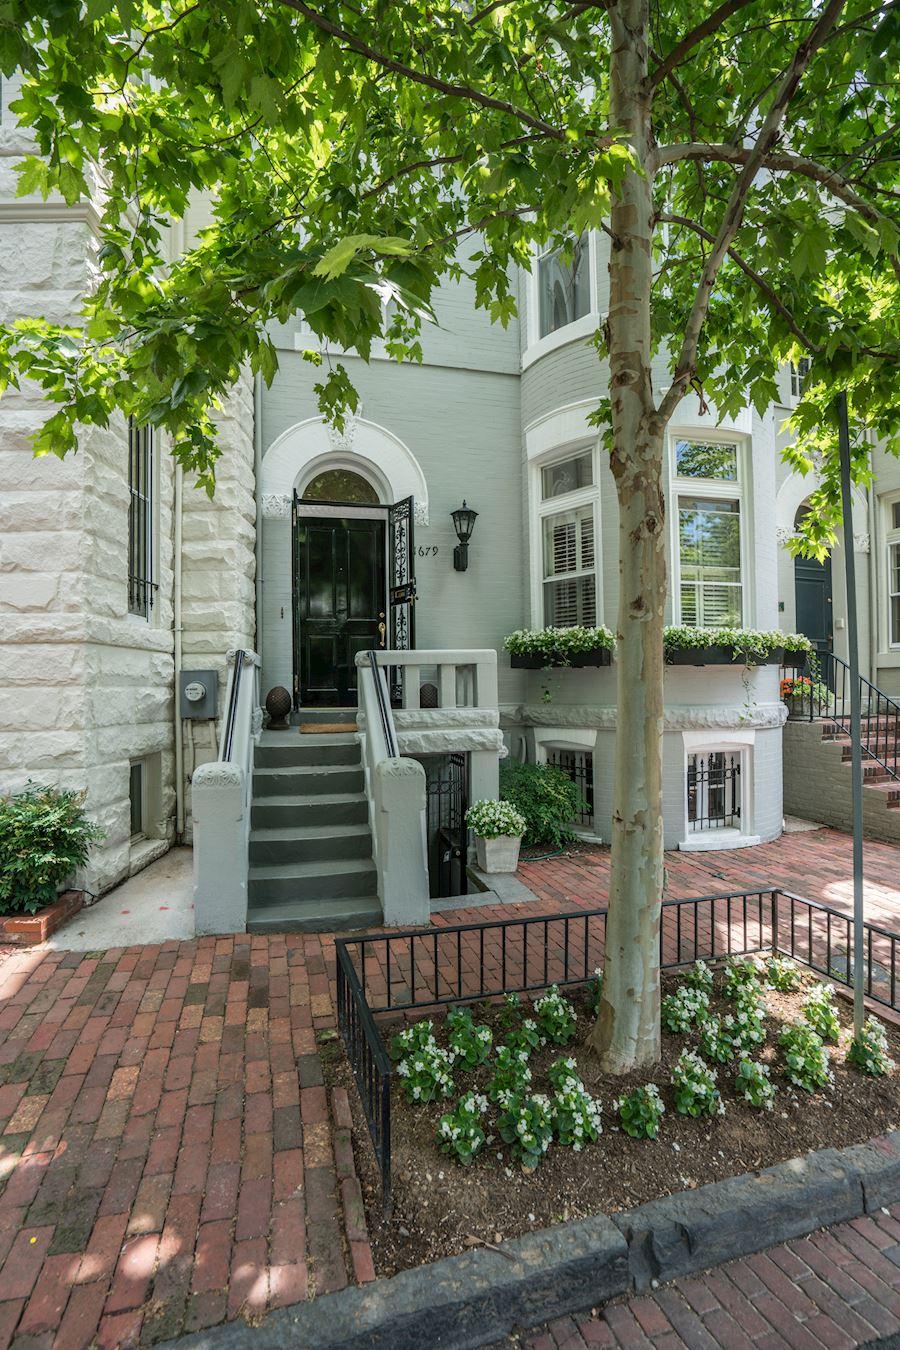 1679 31st St Nw, Washington, DC - USA (photo 1)